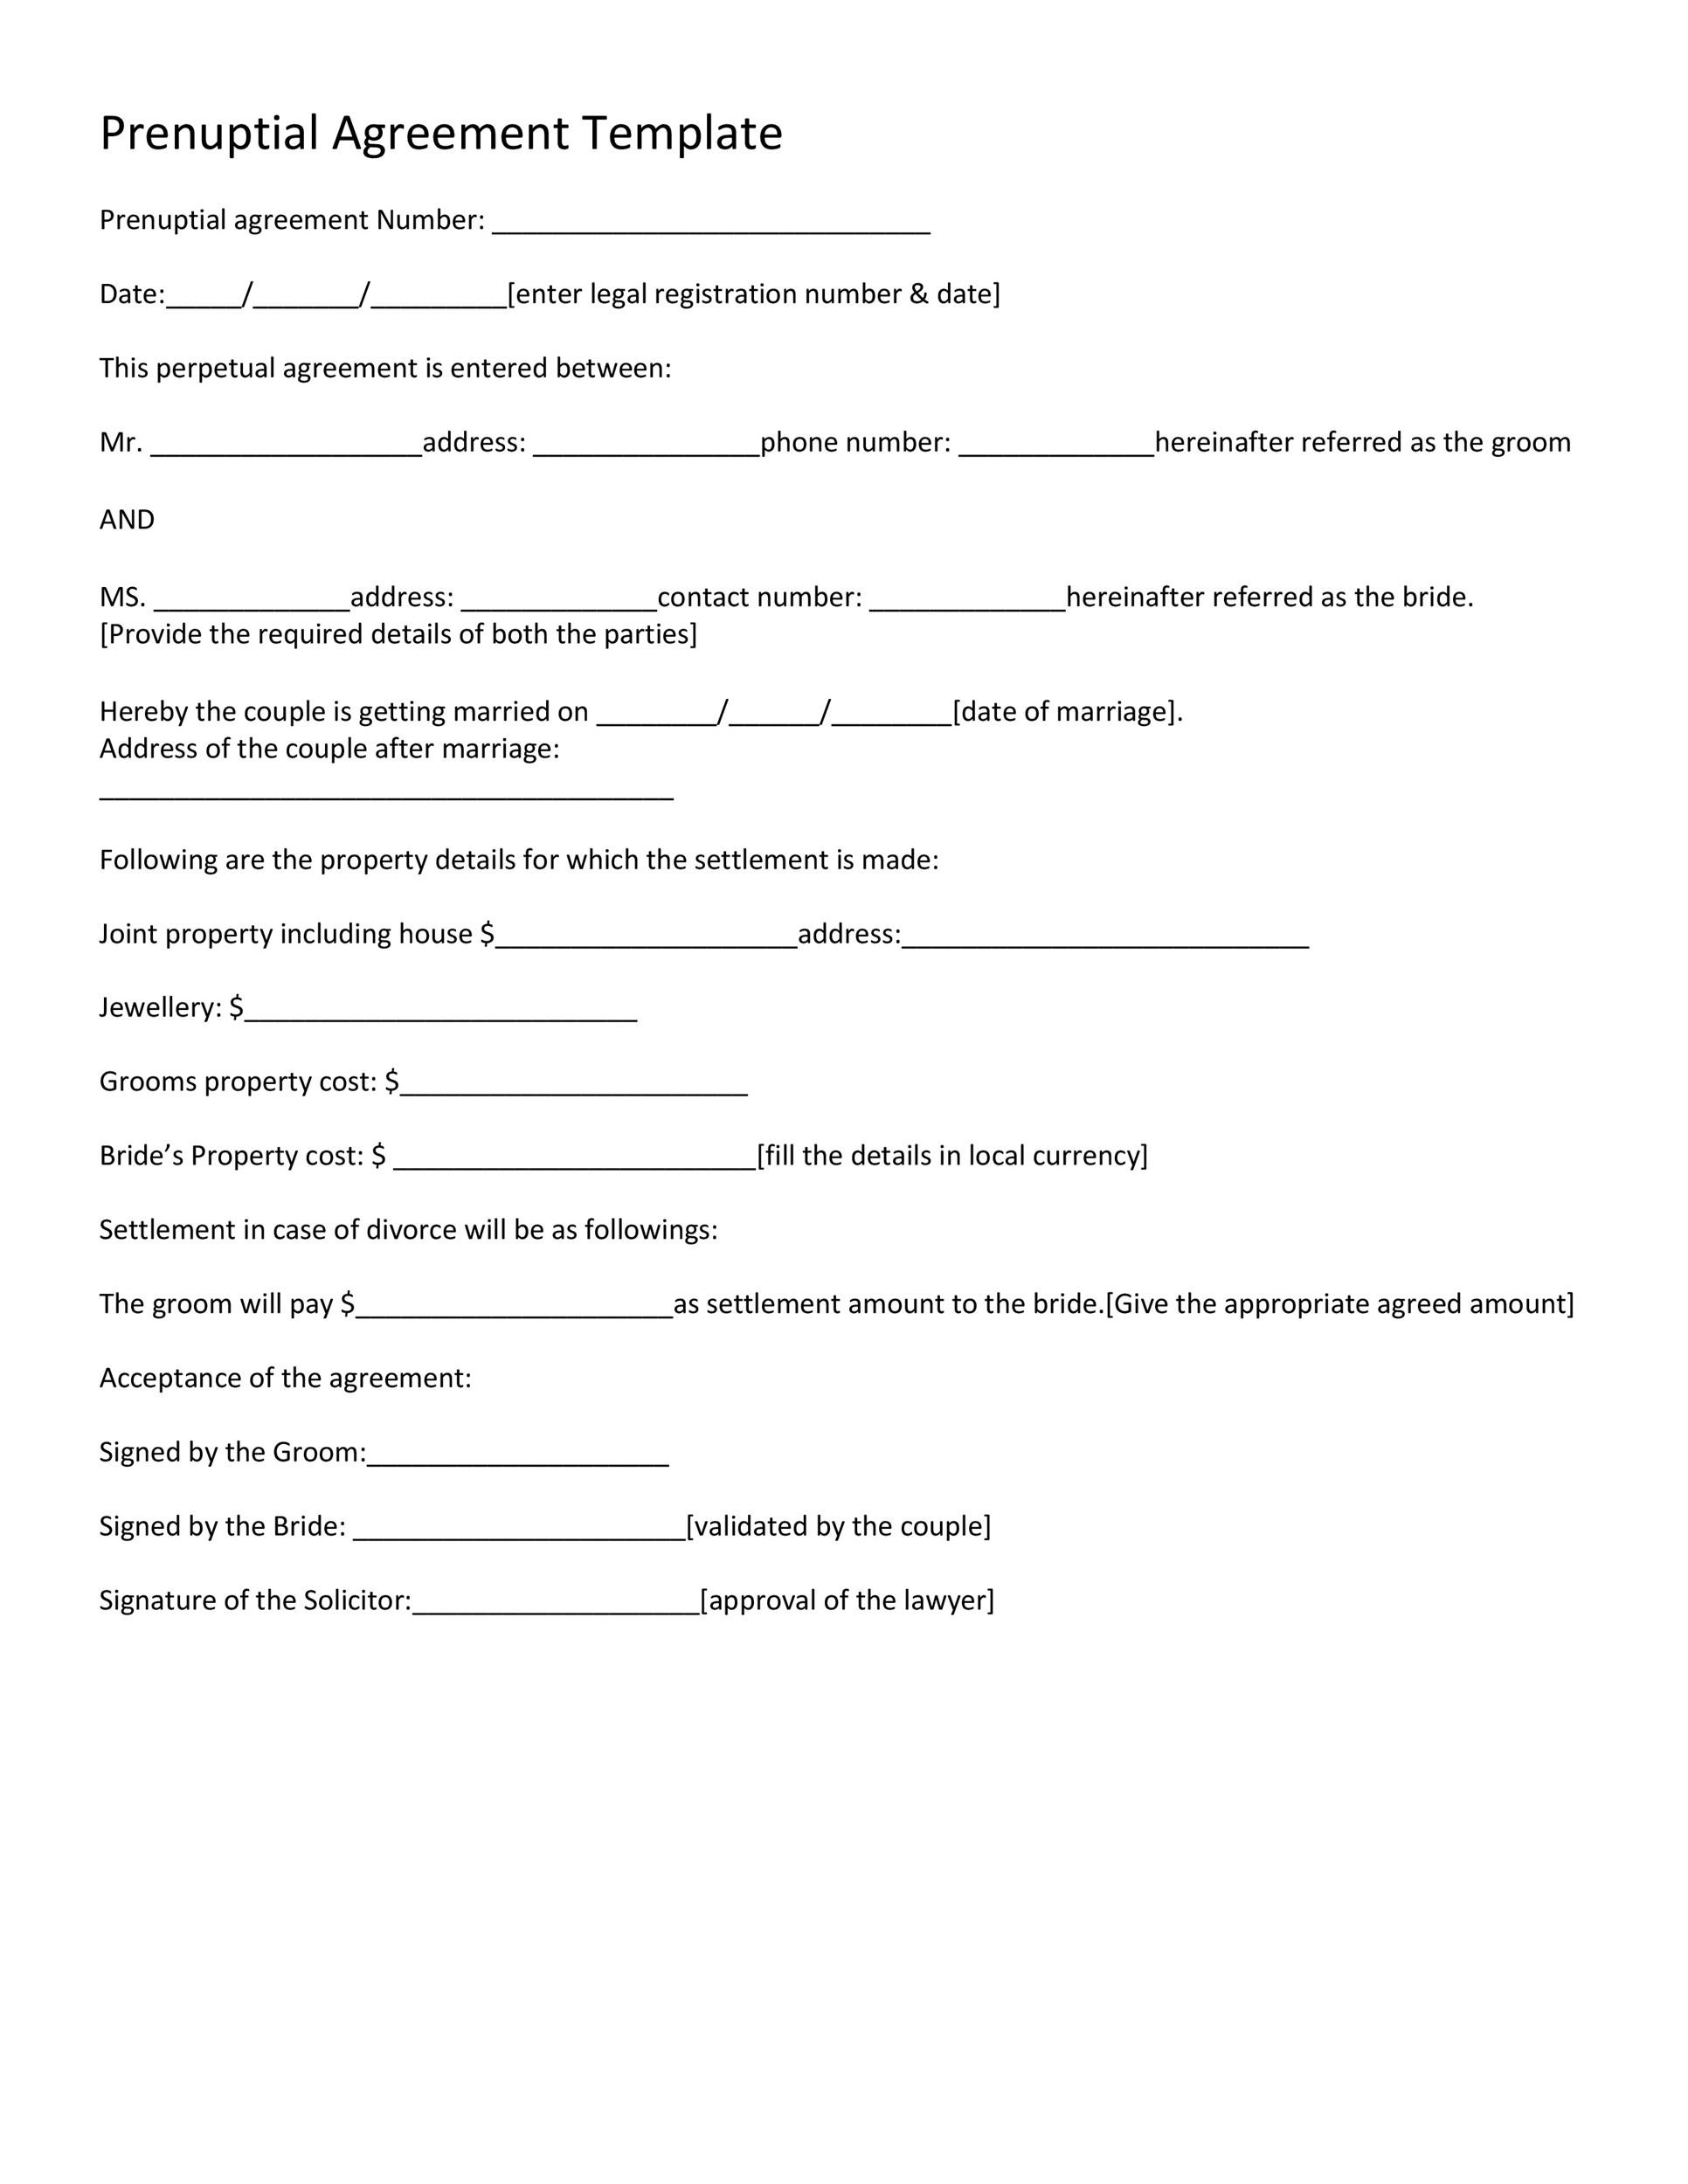 30 Prenuptial Agreement Samples Amp Forms Templatelab